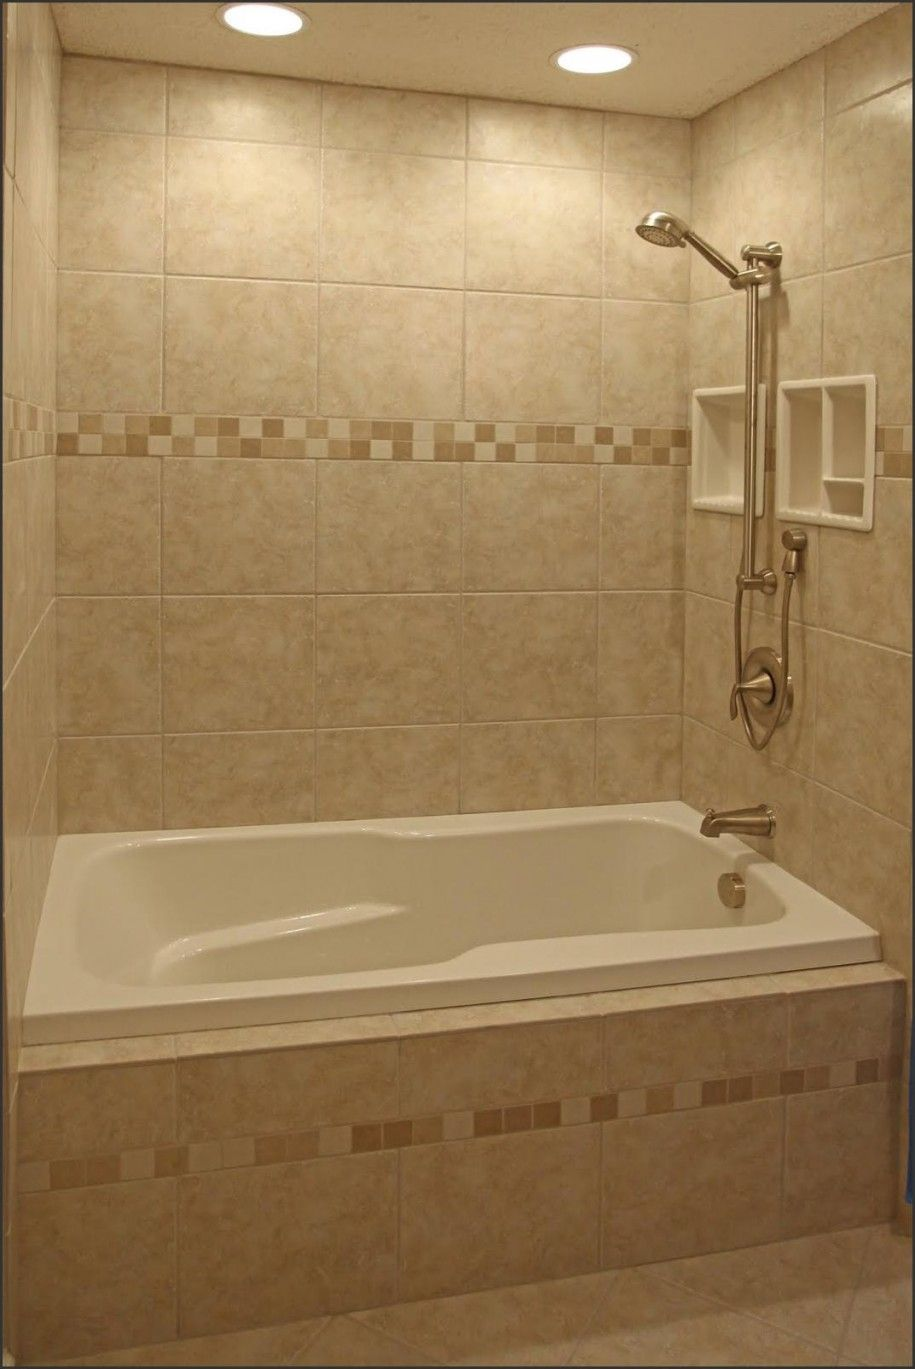 ceramic tile tub surround ideas | Awesome Ceramic Shower Ideas White ...